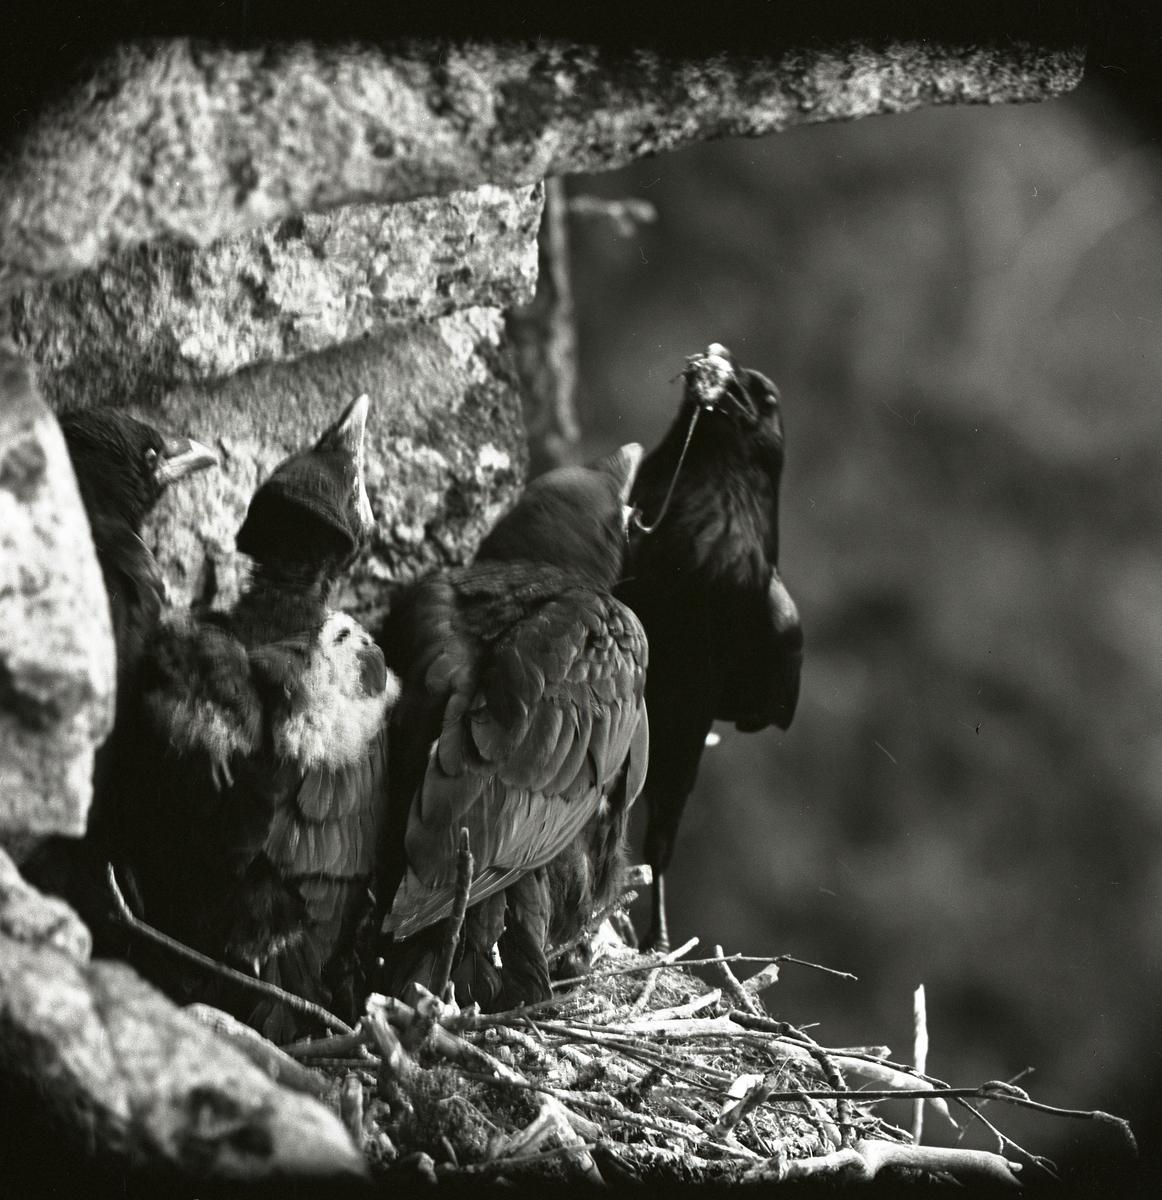 Korpungar matas i bo på ett klippblock, Gruvberget i maj 1962.